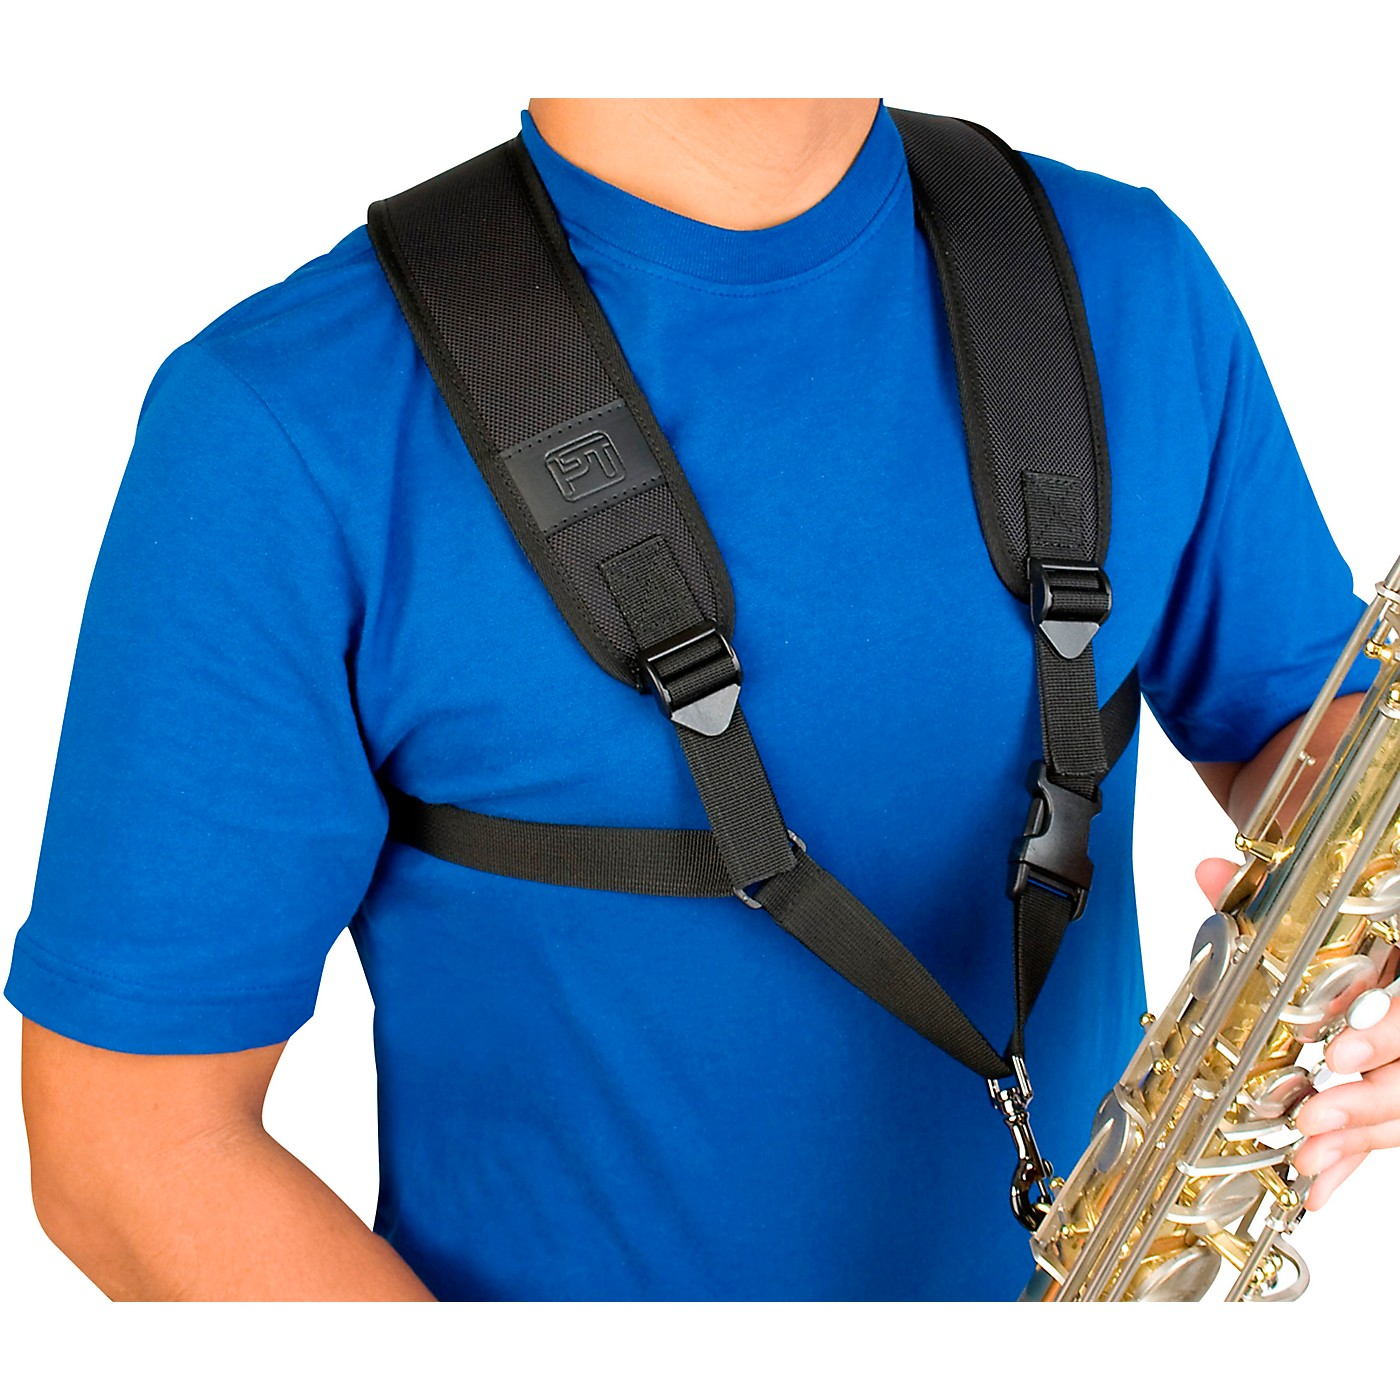 Protec Universal Saxophone Harness thumbnail